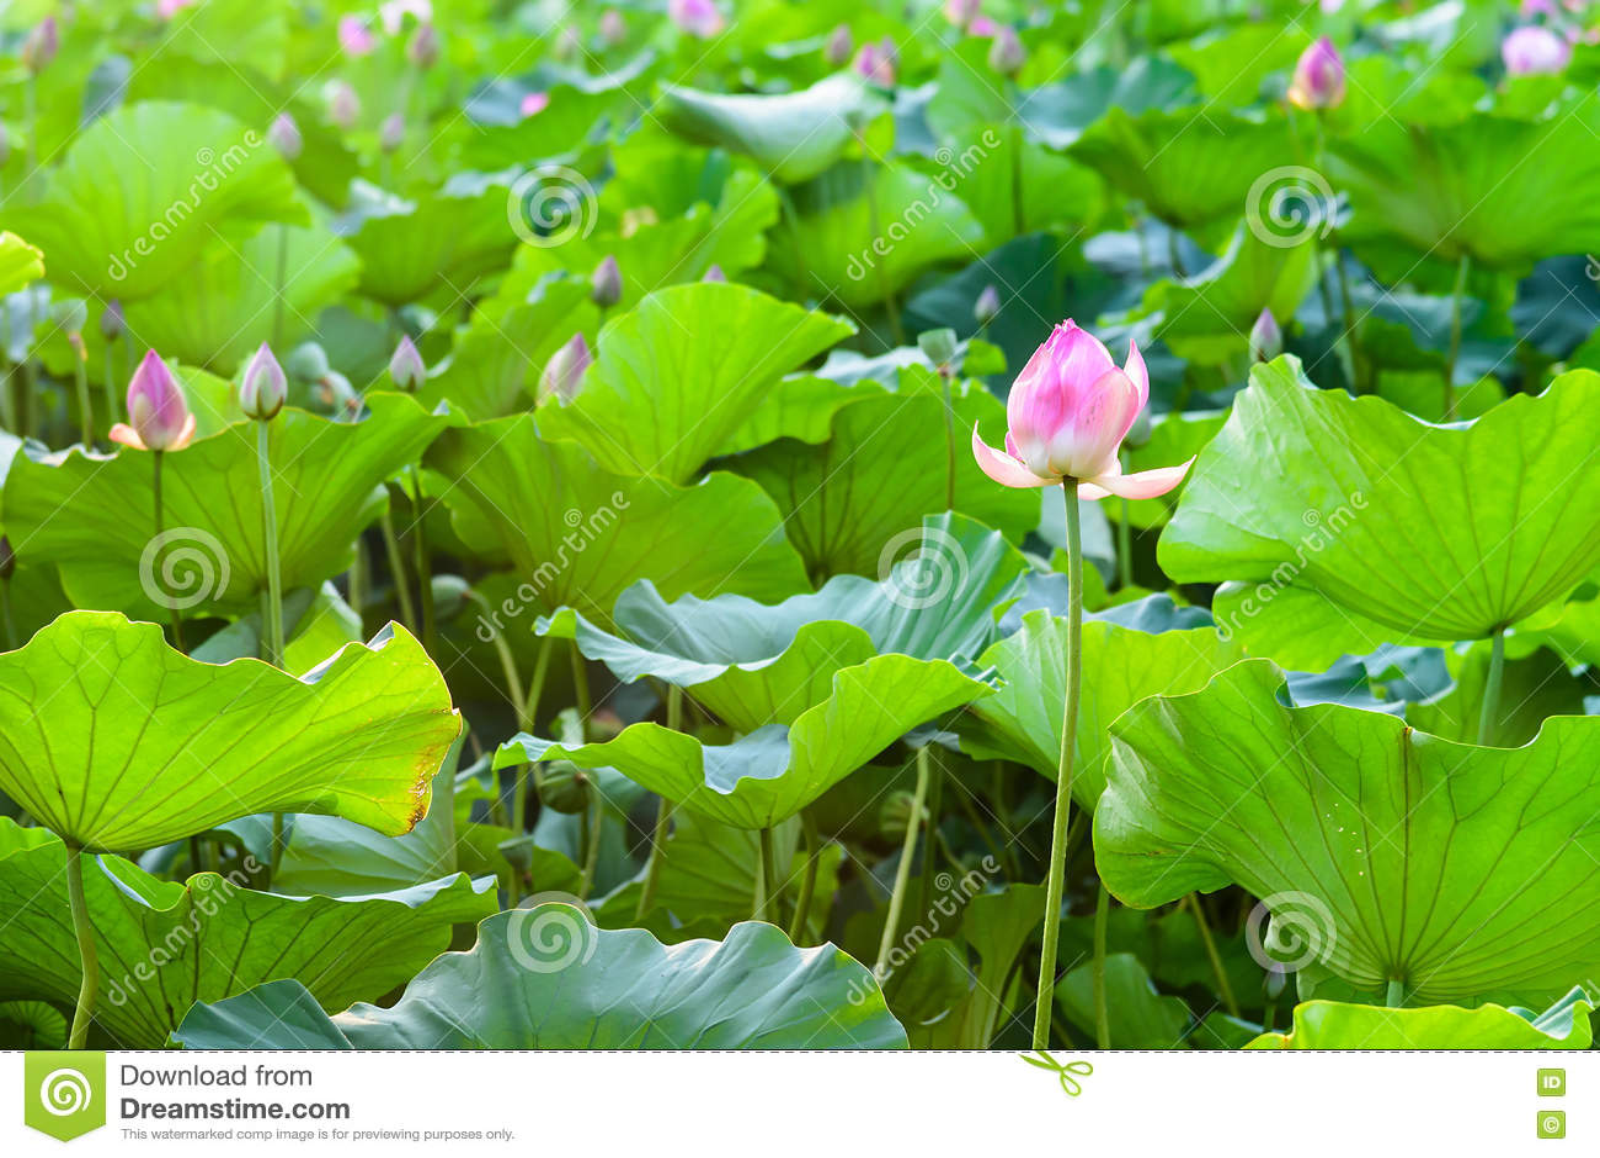 Lotus e a folha dos lótus